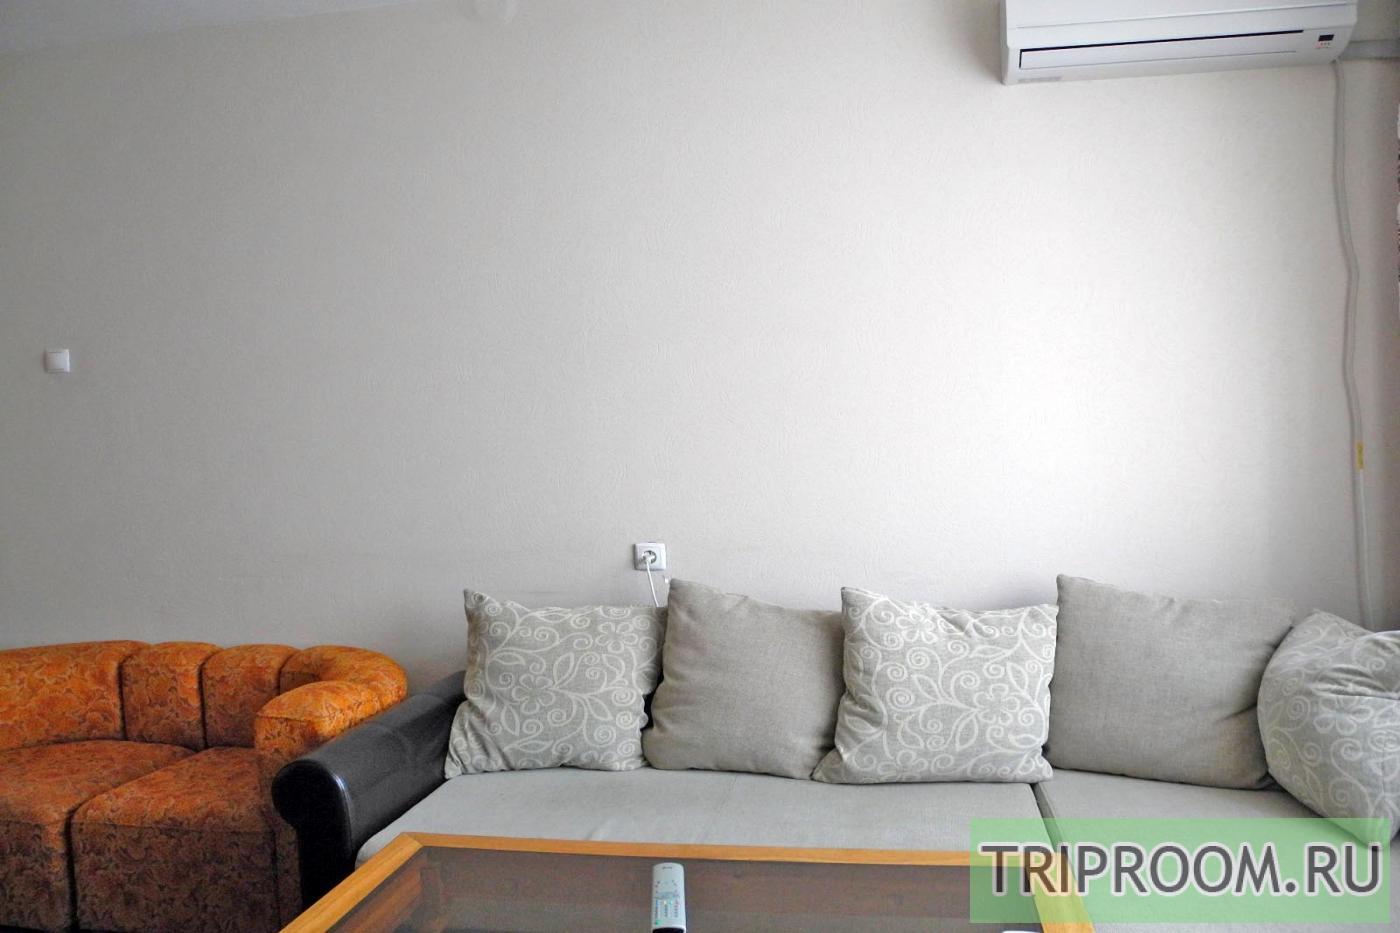 2-комнатная квартира посуточно (вариант № 3868), ул. Кропоткина улица, фото № 2